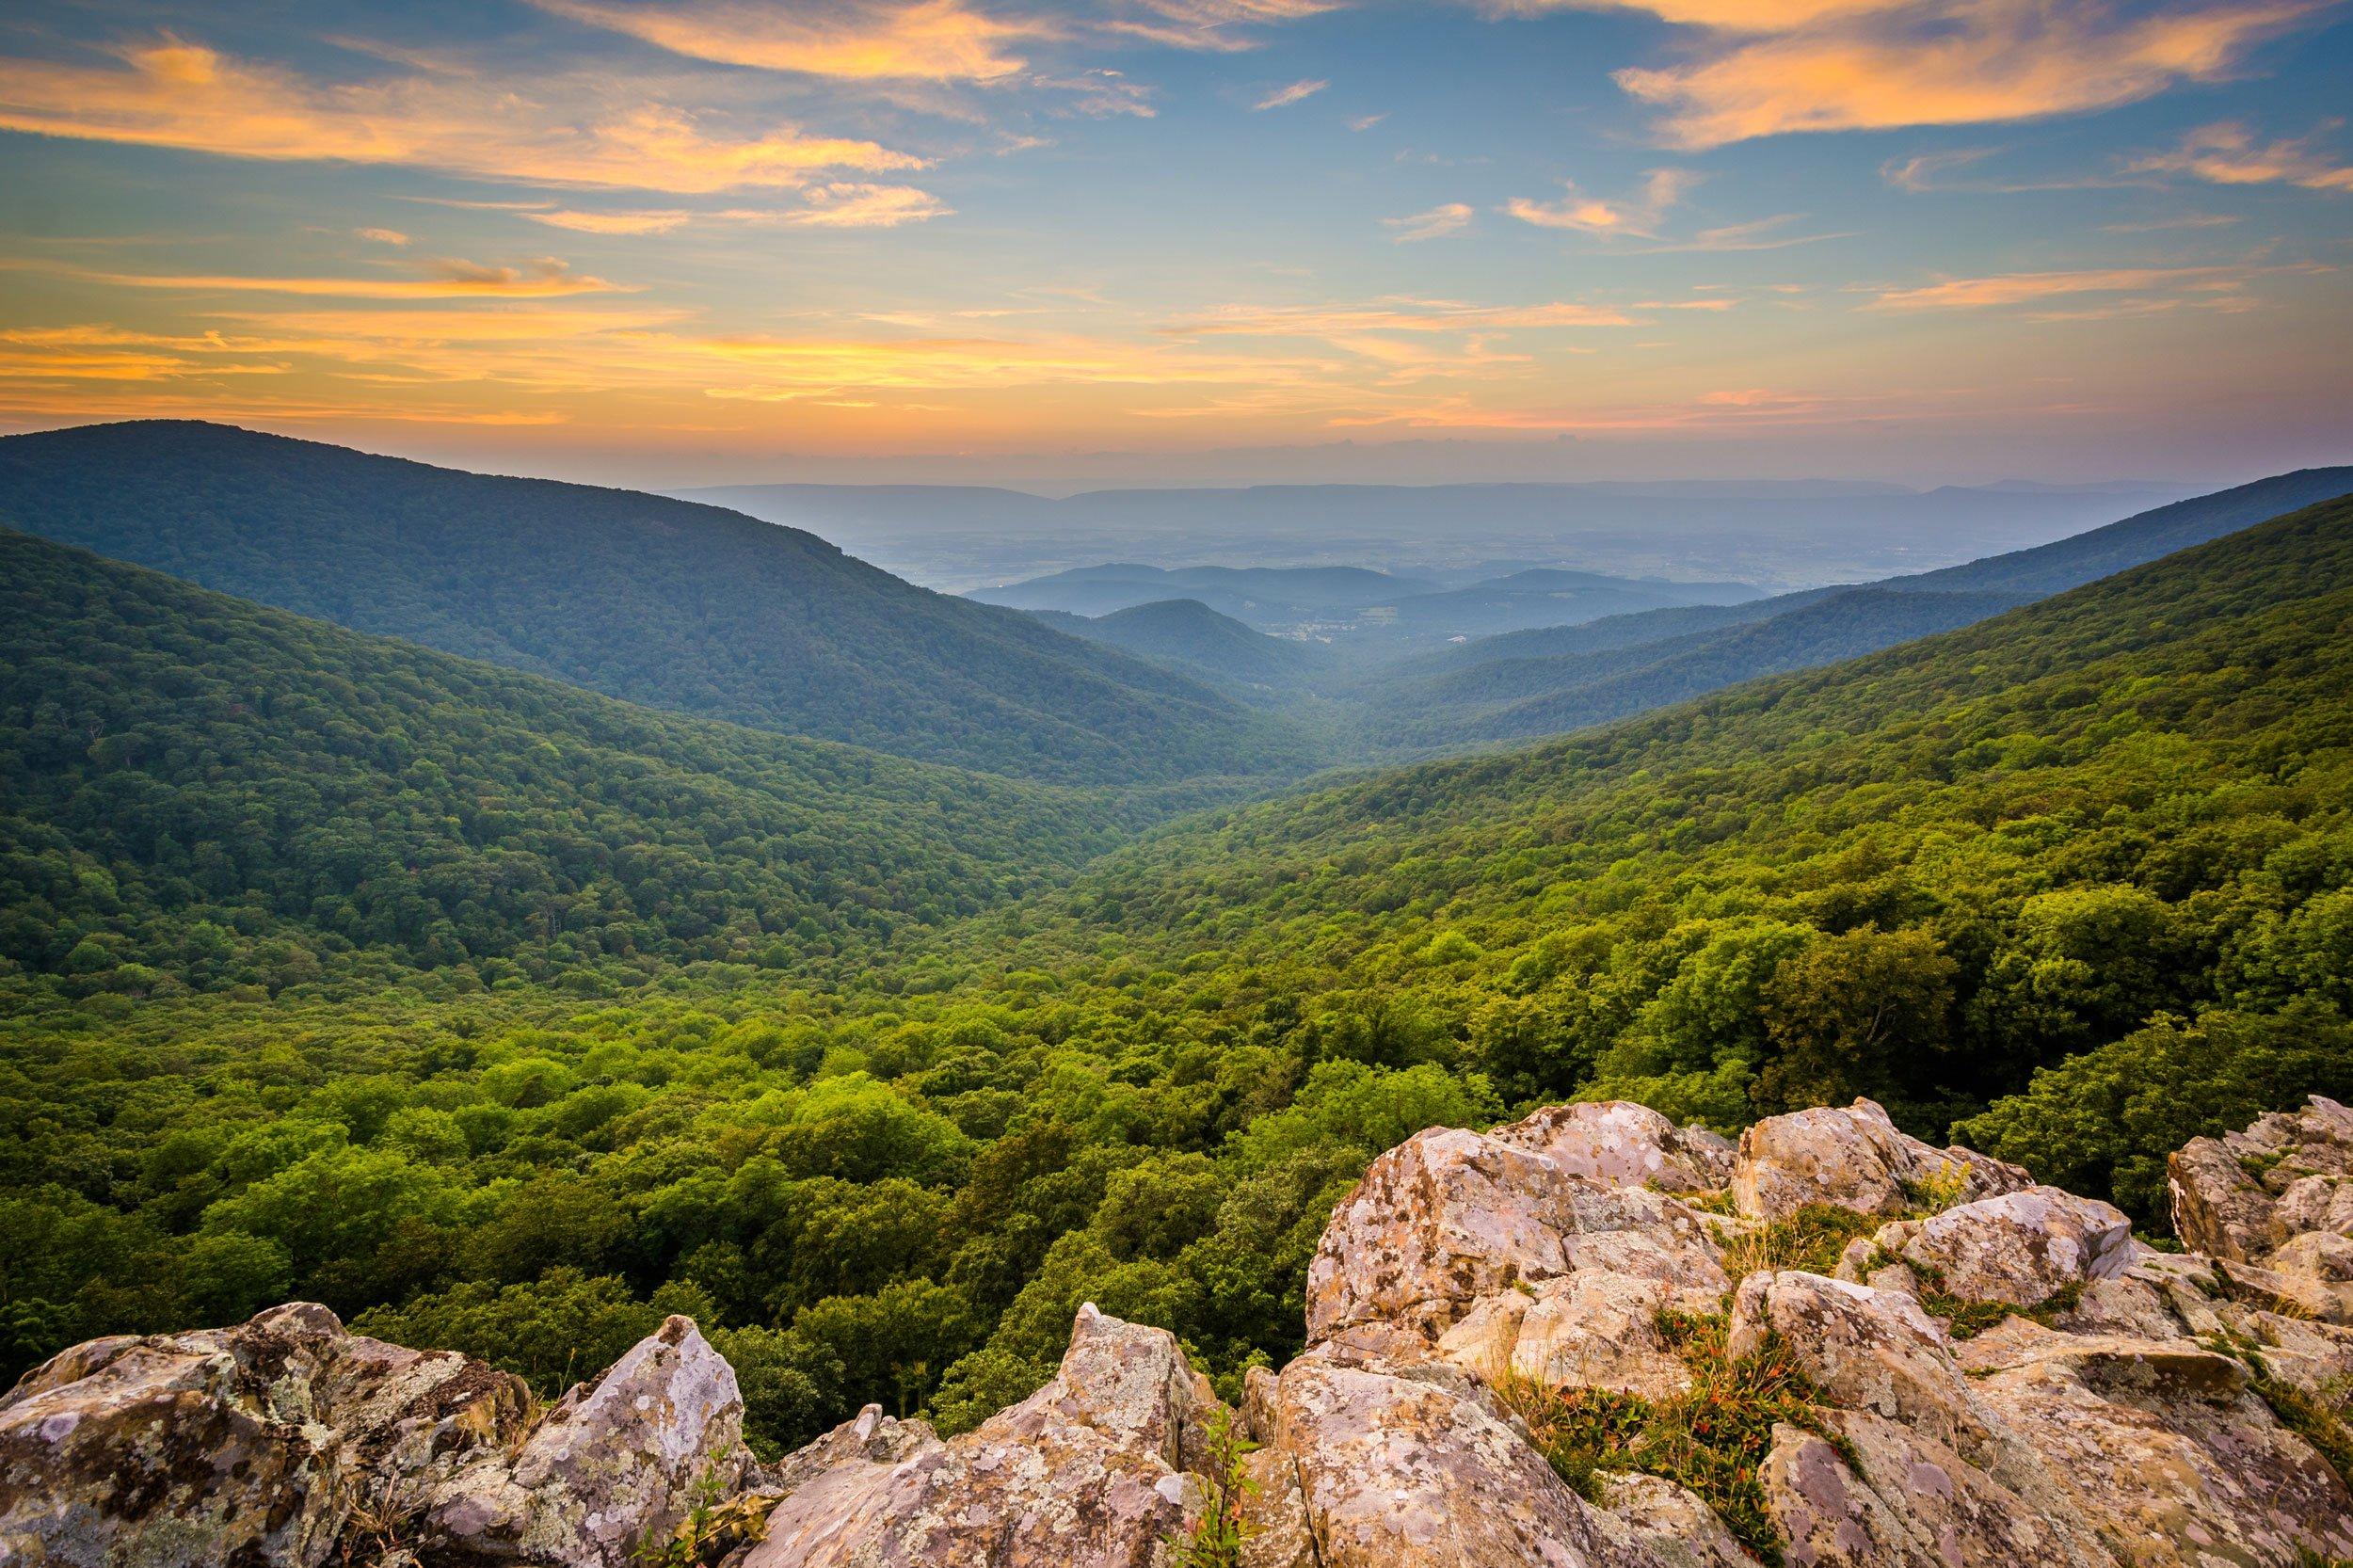 Shenandoah National Park | 2 Week Virginia Road Trip from Washington DC